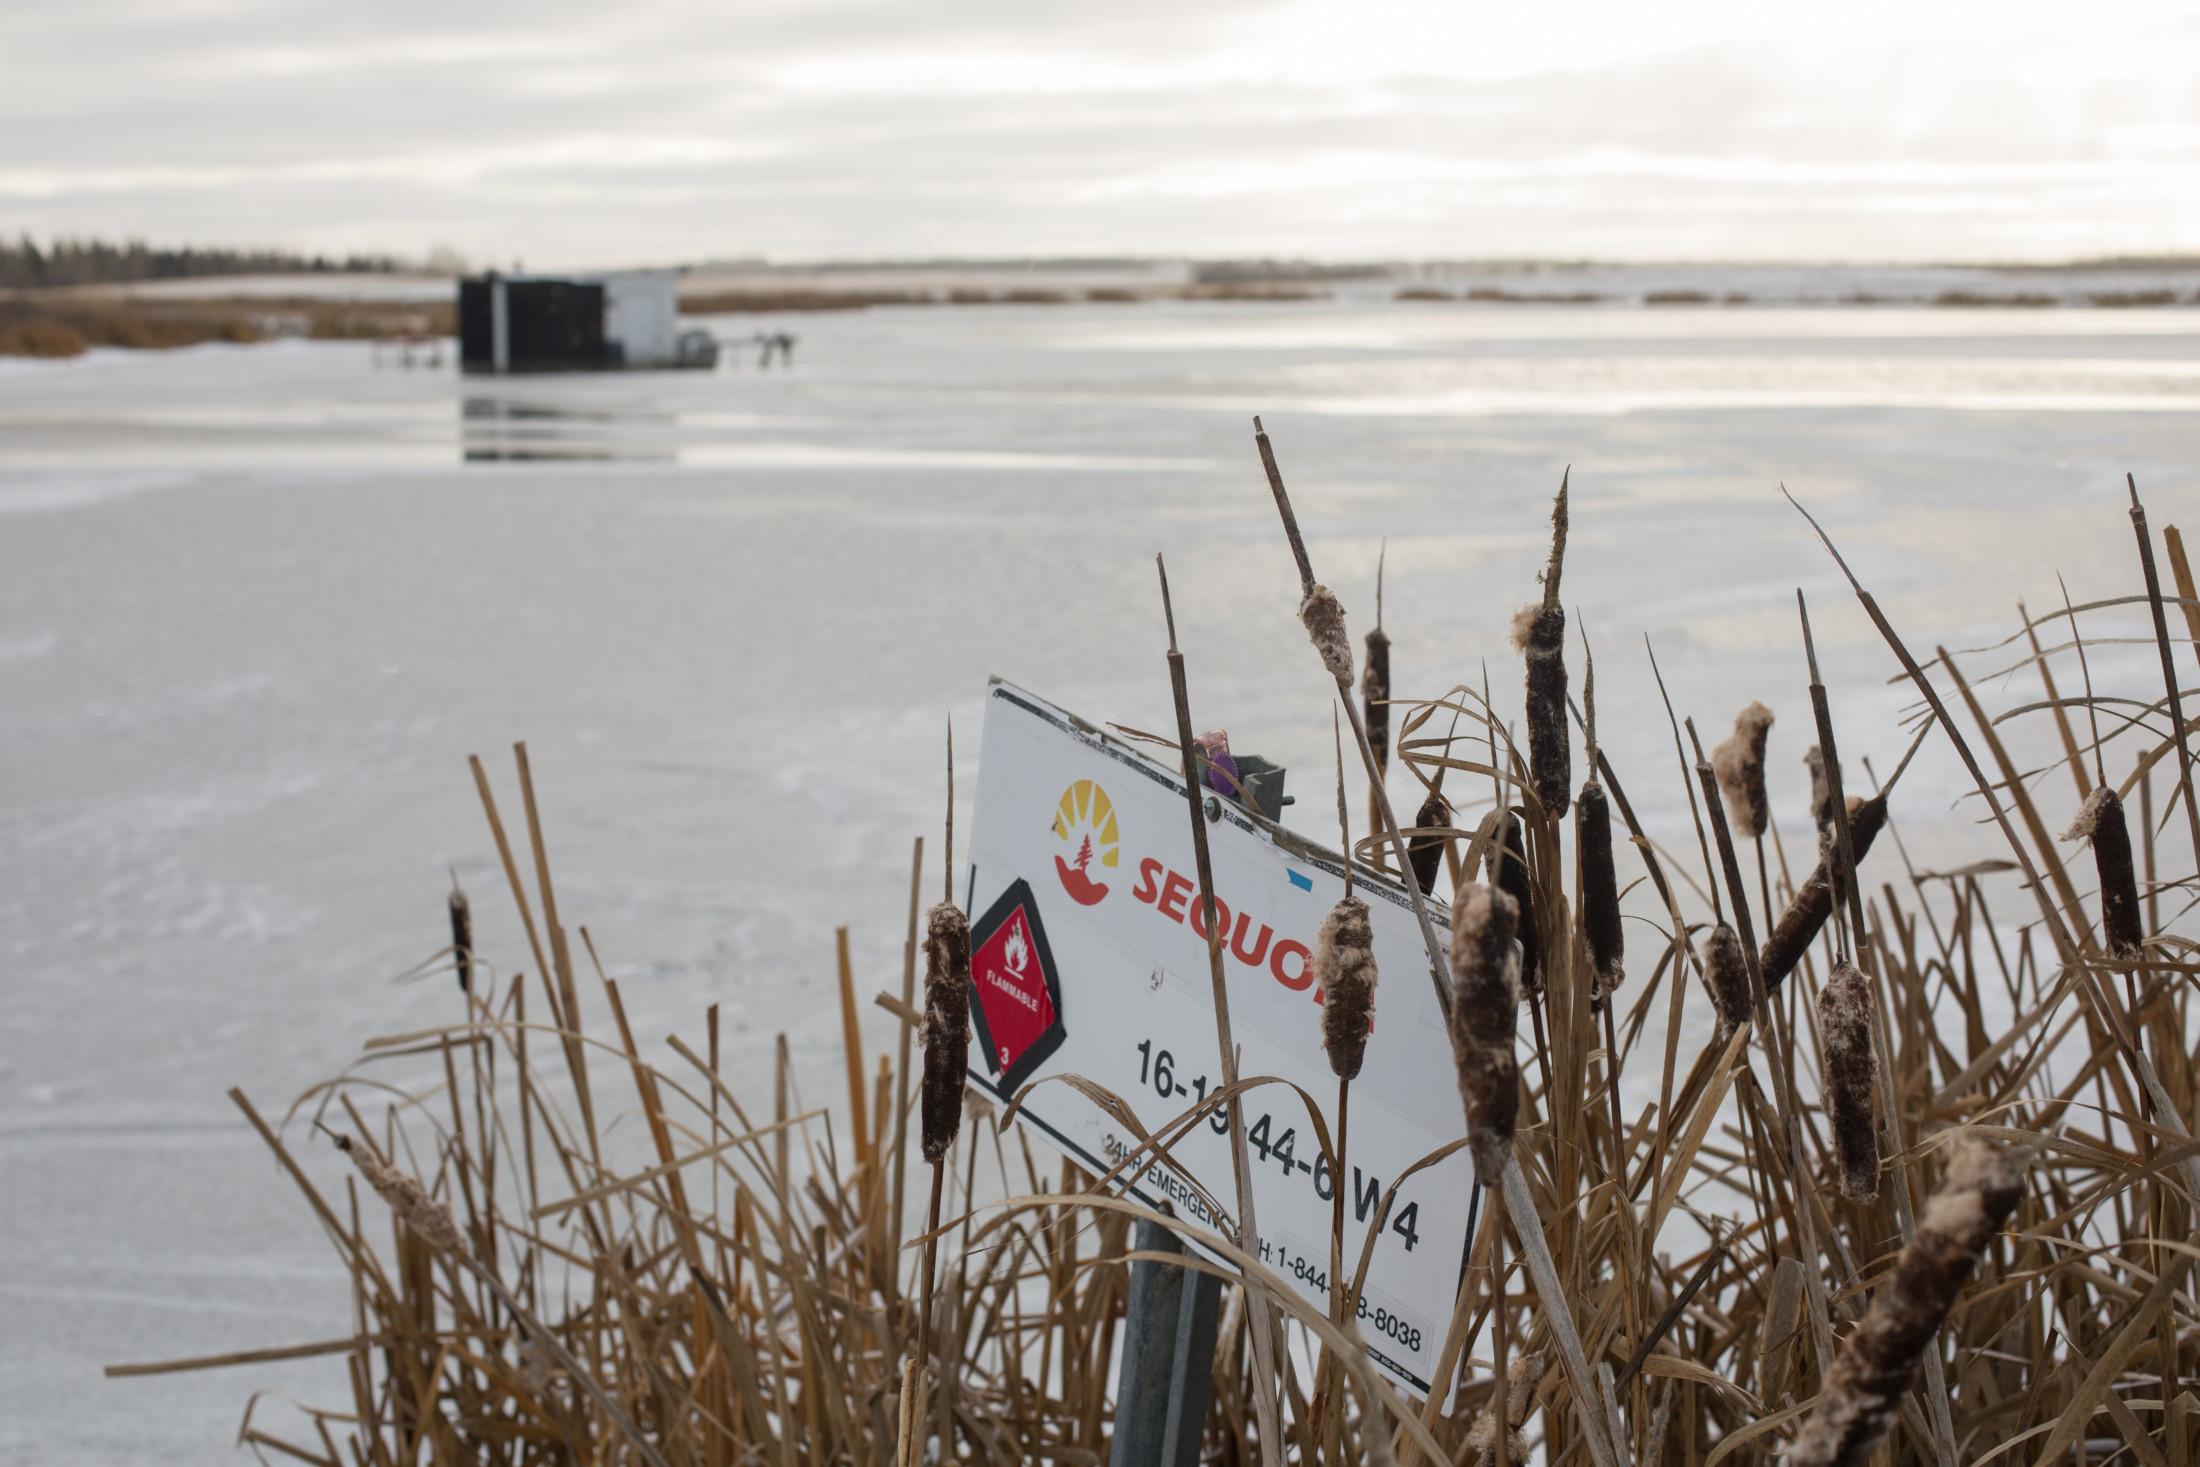 Oil lease site Wainwright, Alberta